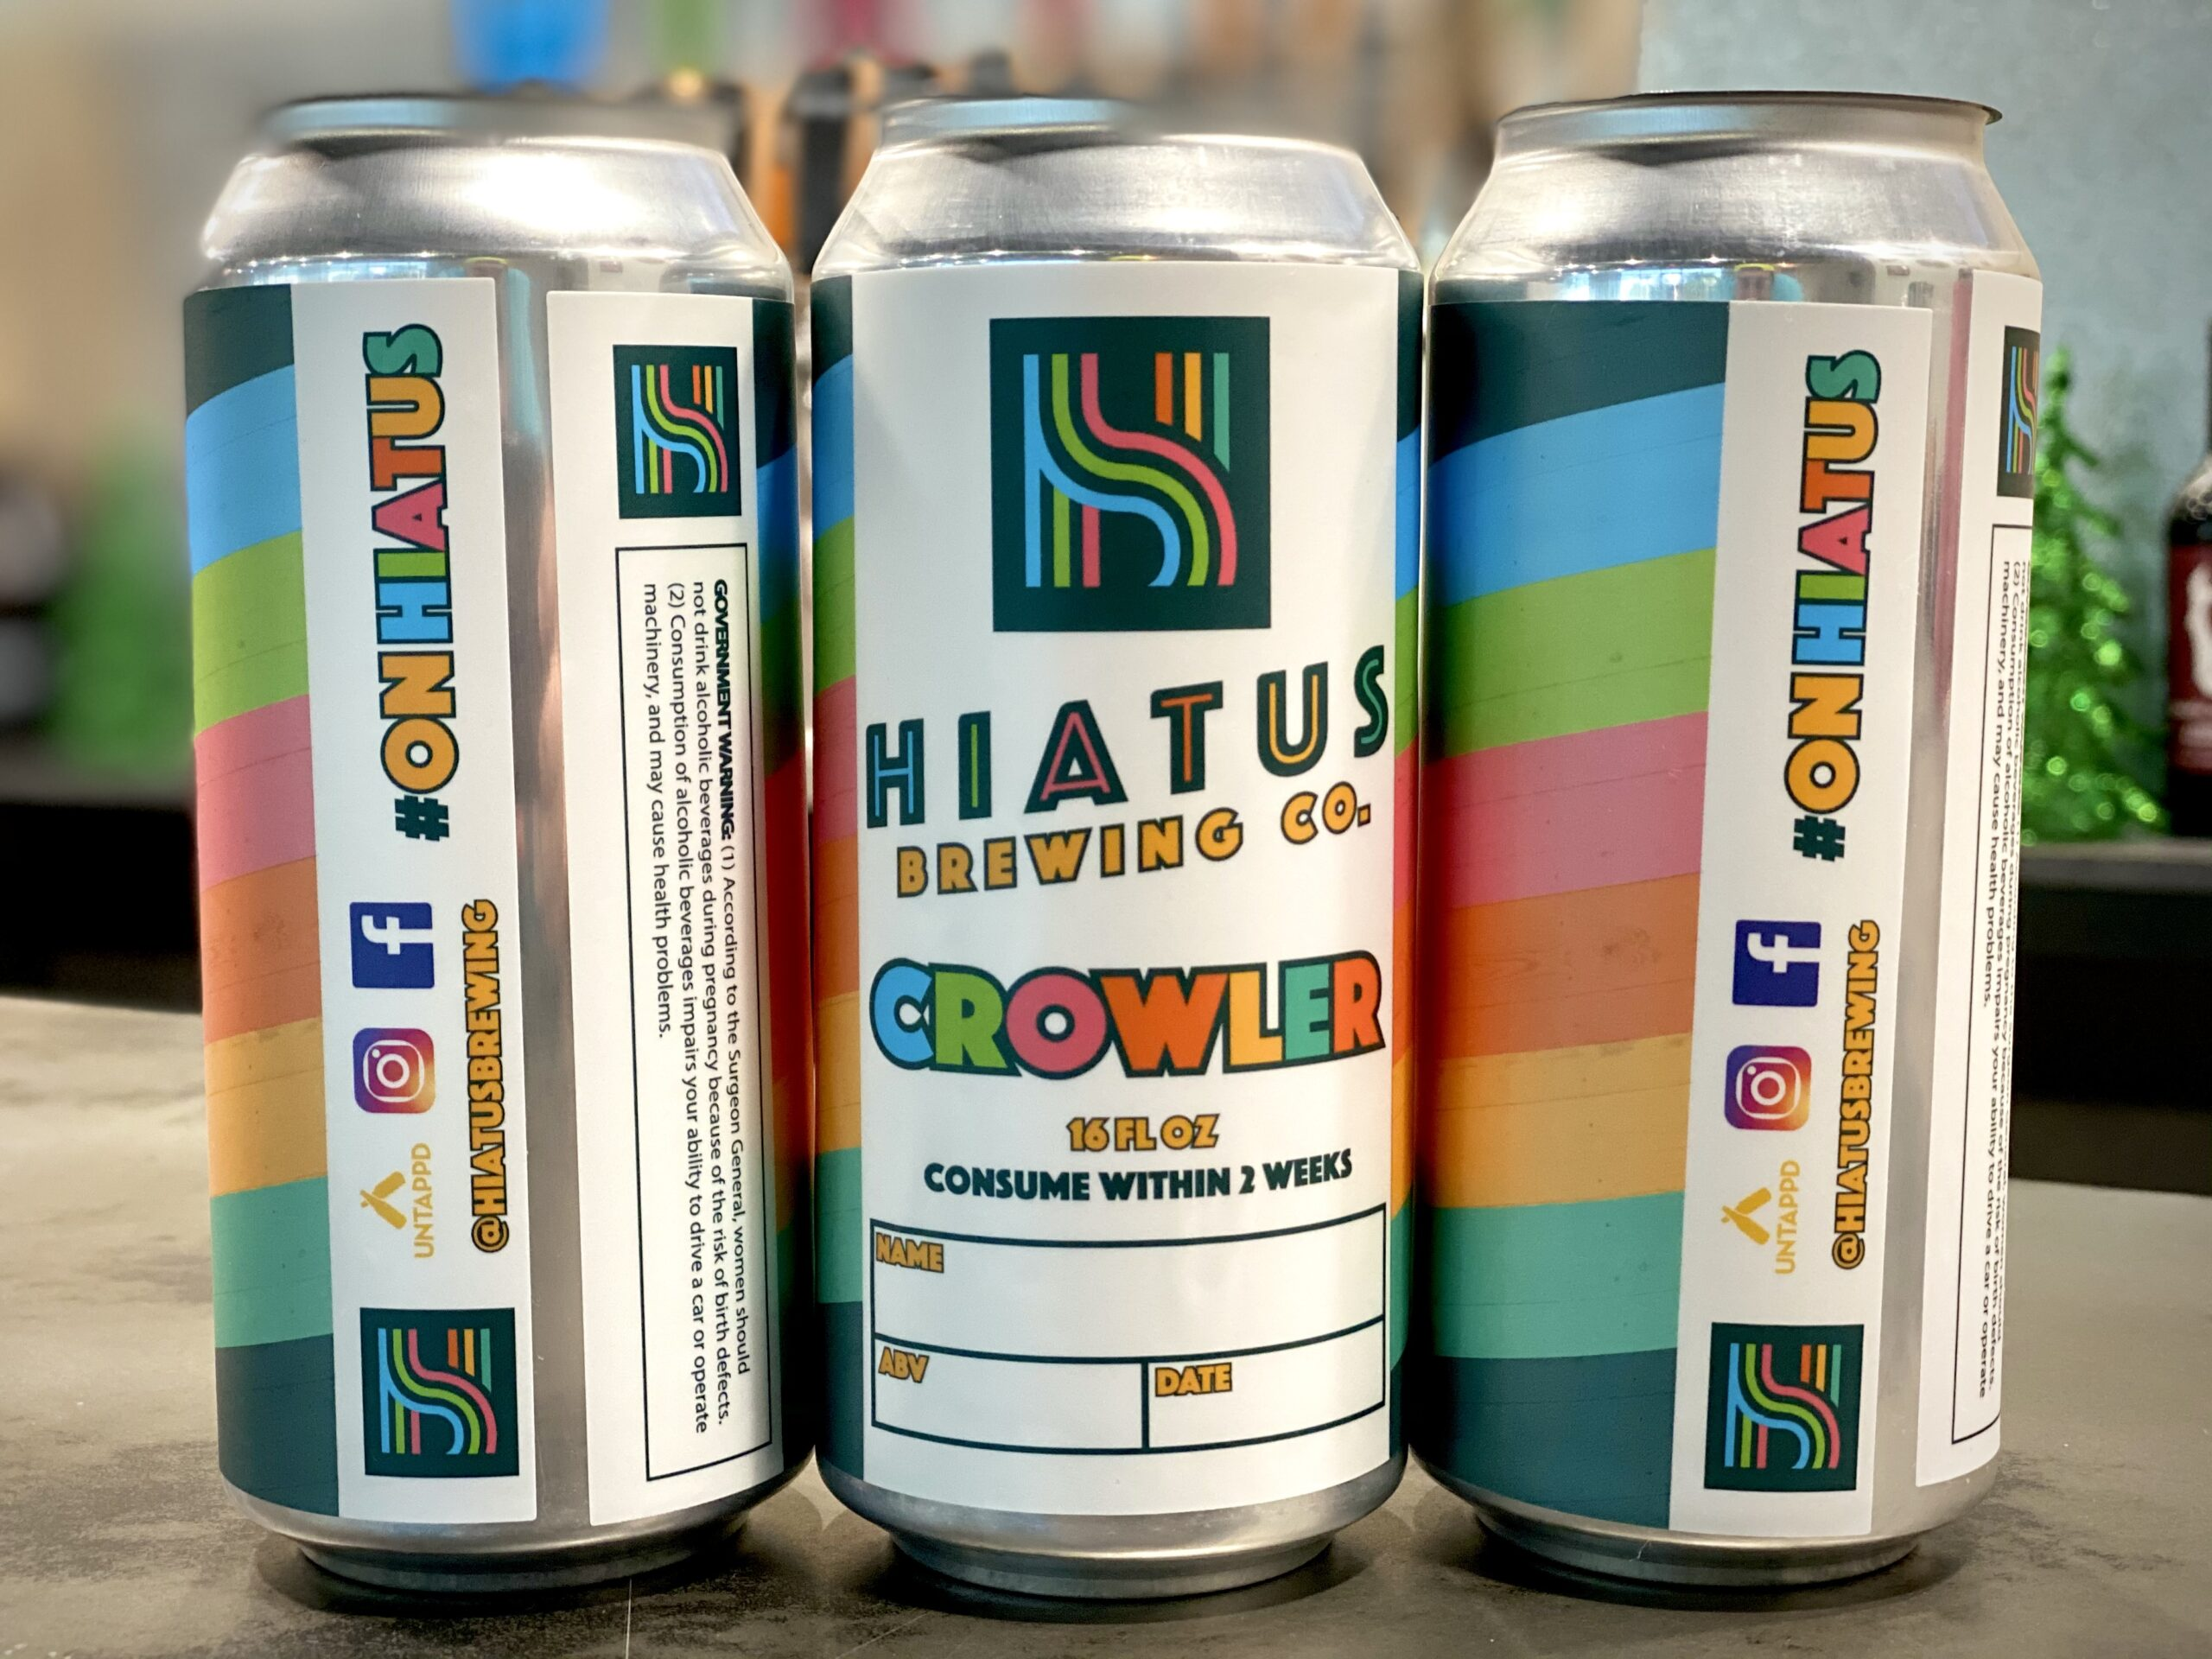 Hiatus Brewing Company